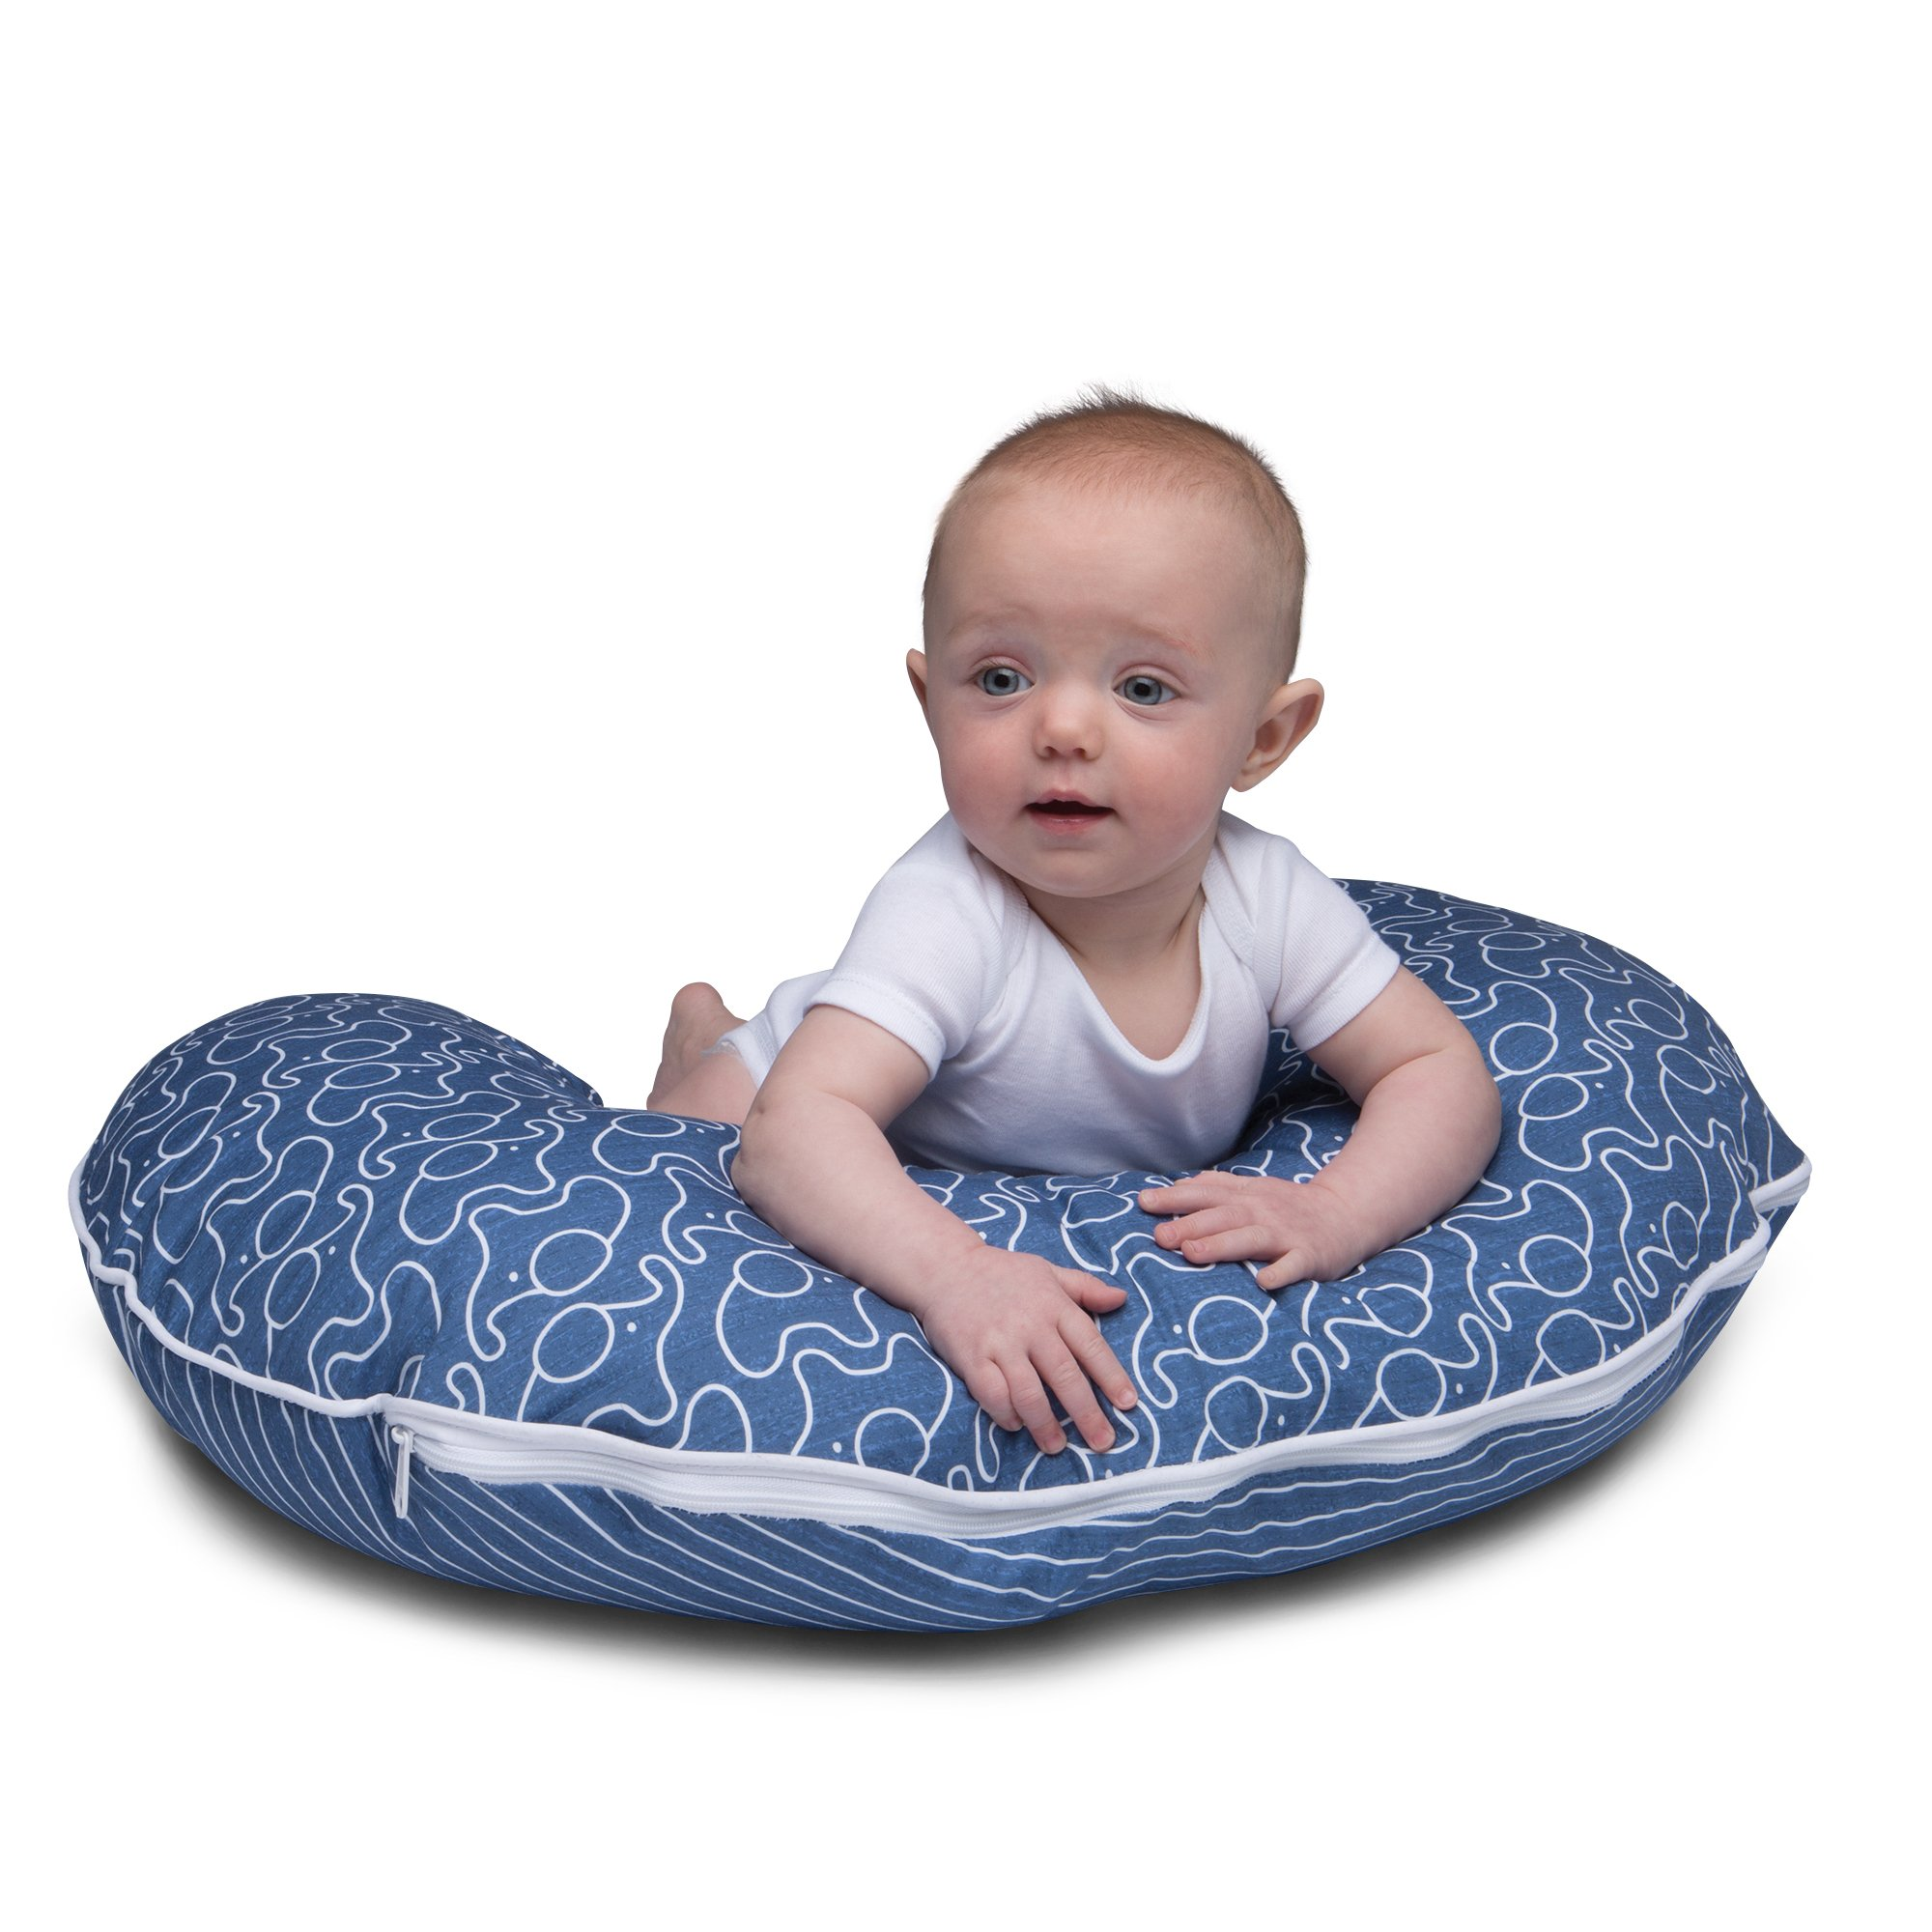 Boppy Pillow Slipcover, Blue Classic Plus Modern Elephants by Boppy (Image #6)